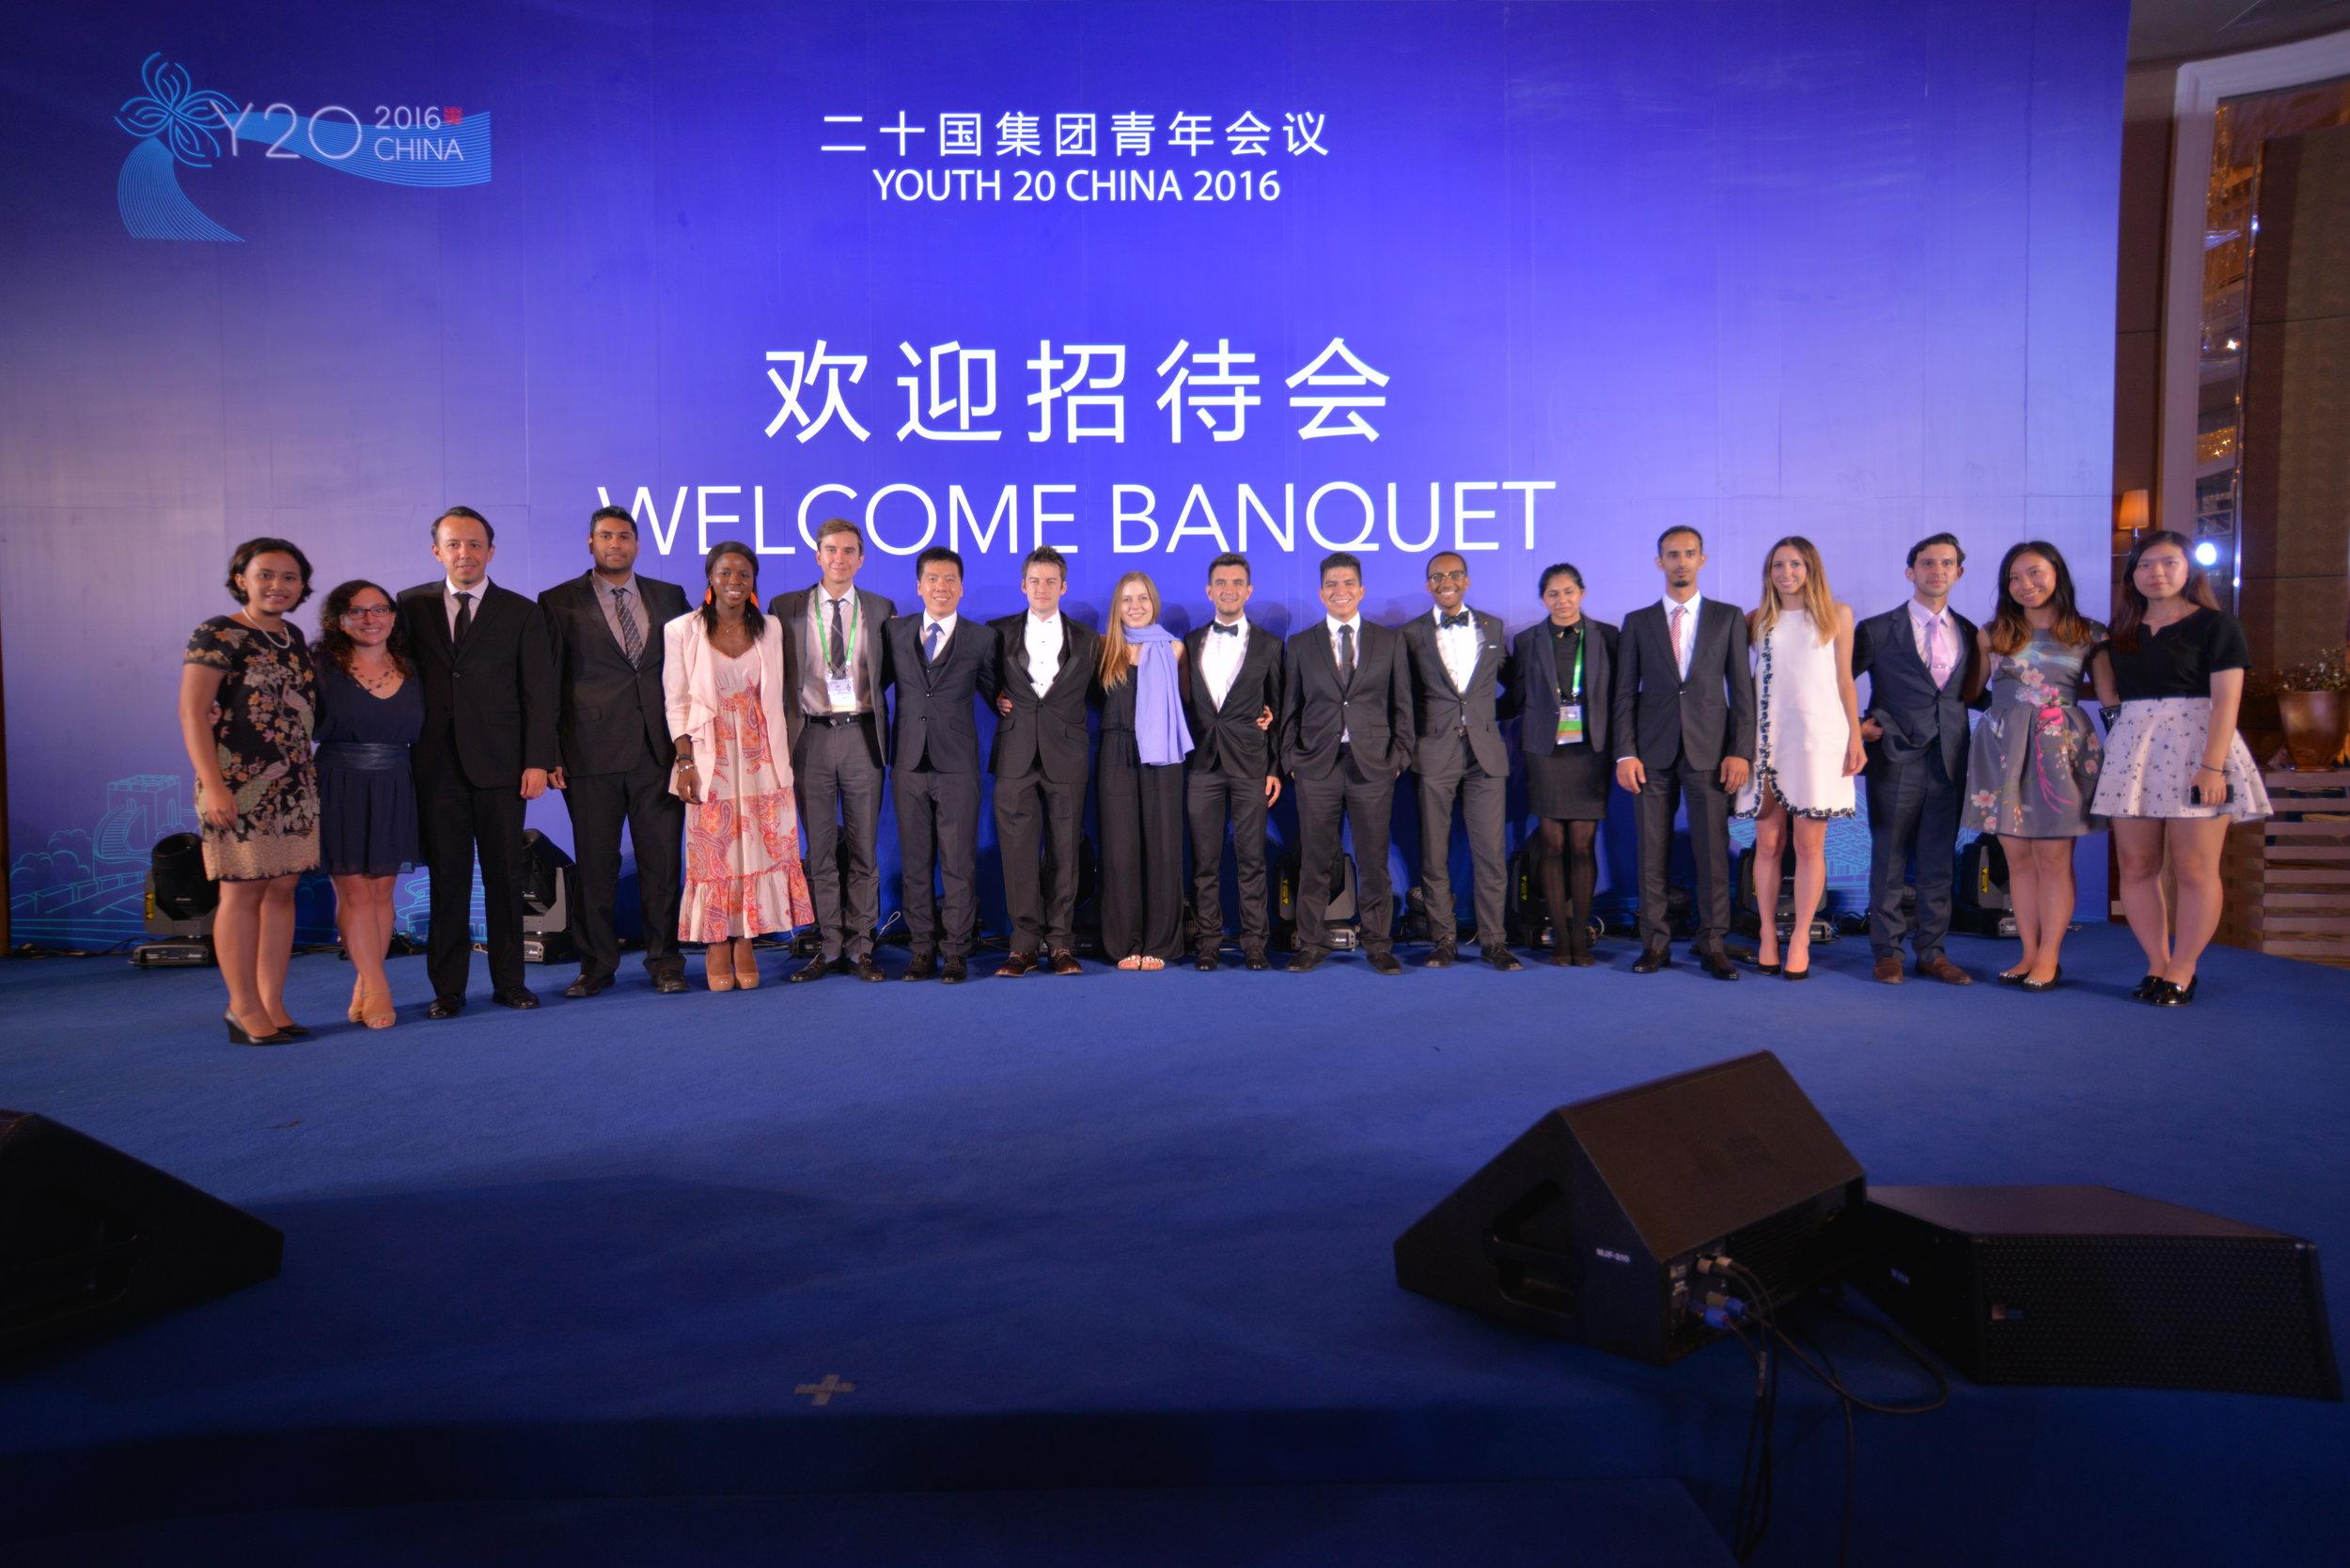 Group Photo of Welcome Banquet (Shanghai 2016) 2.JPG.JPG